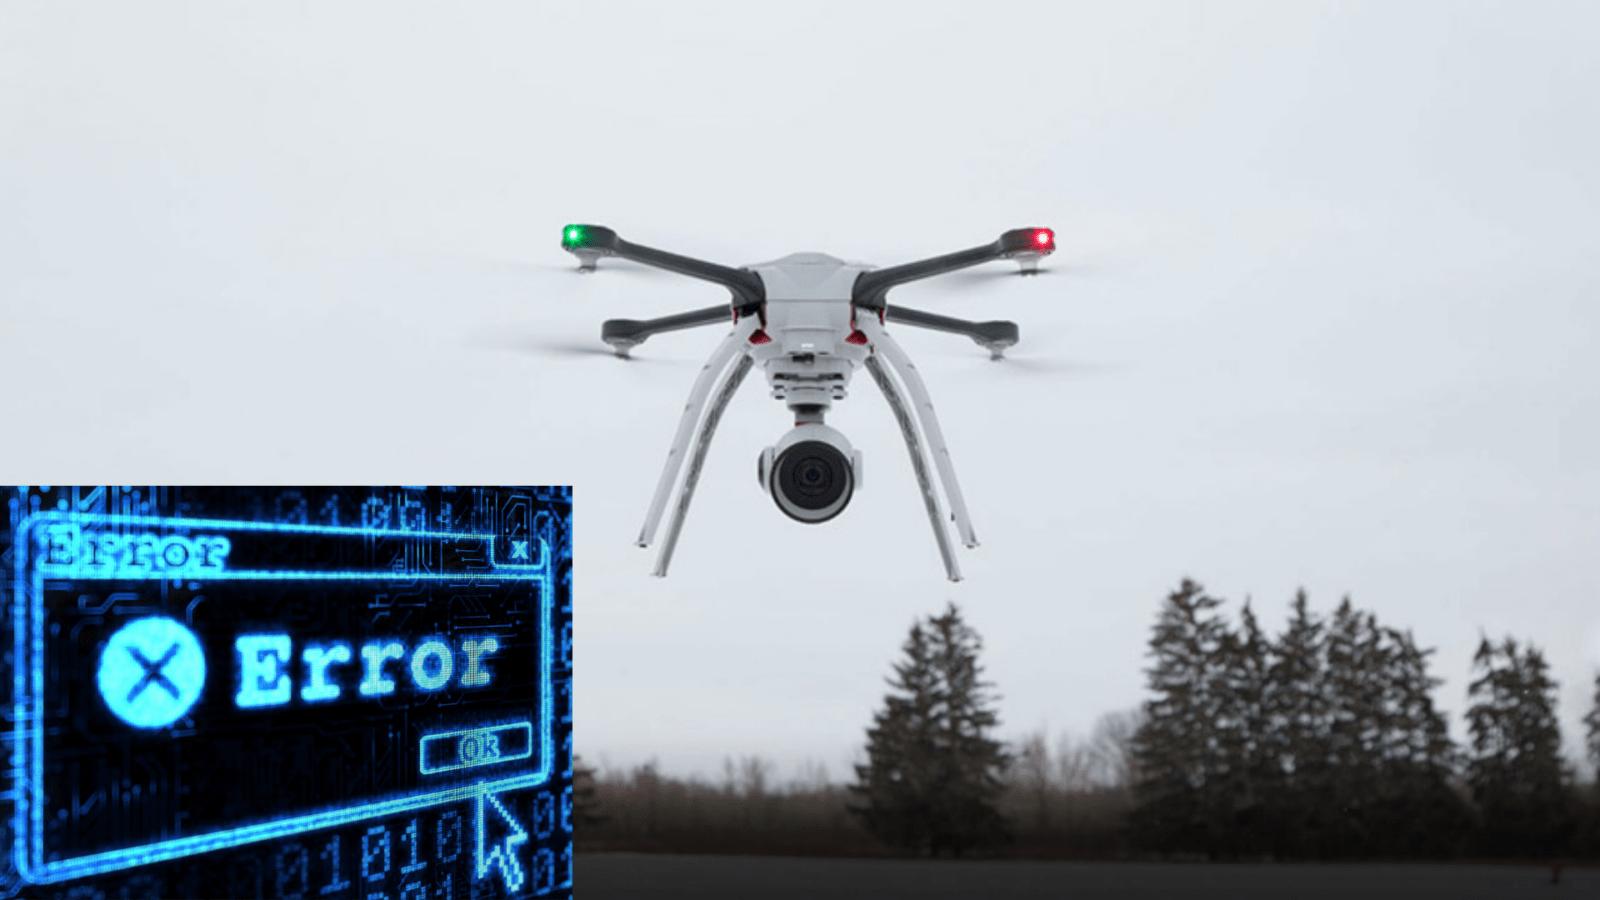 Пилот квадрокоптера случайно нажал кнопку и уничтожил дрон за 85 000 долларов.